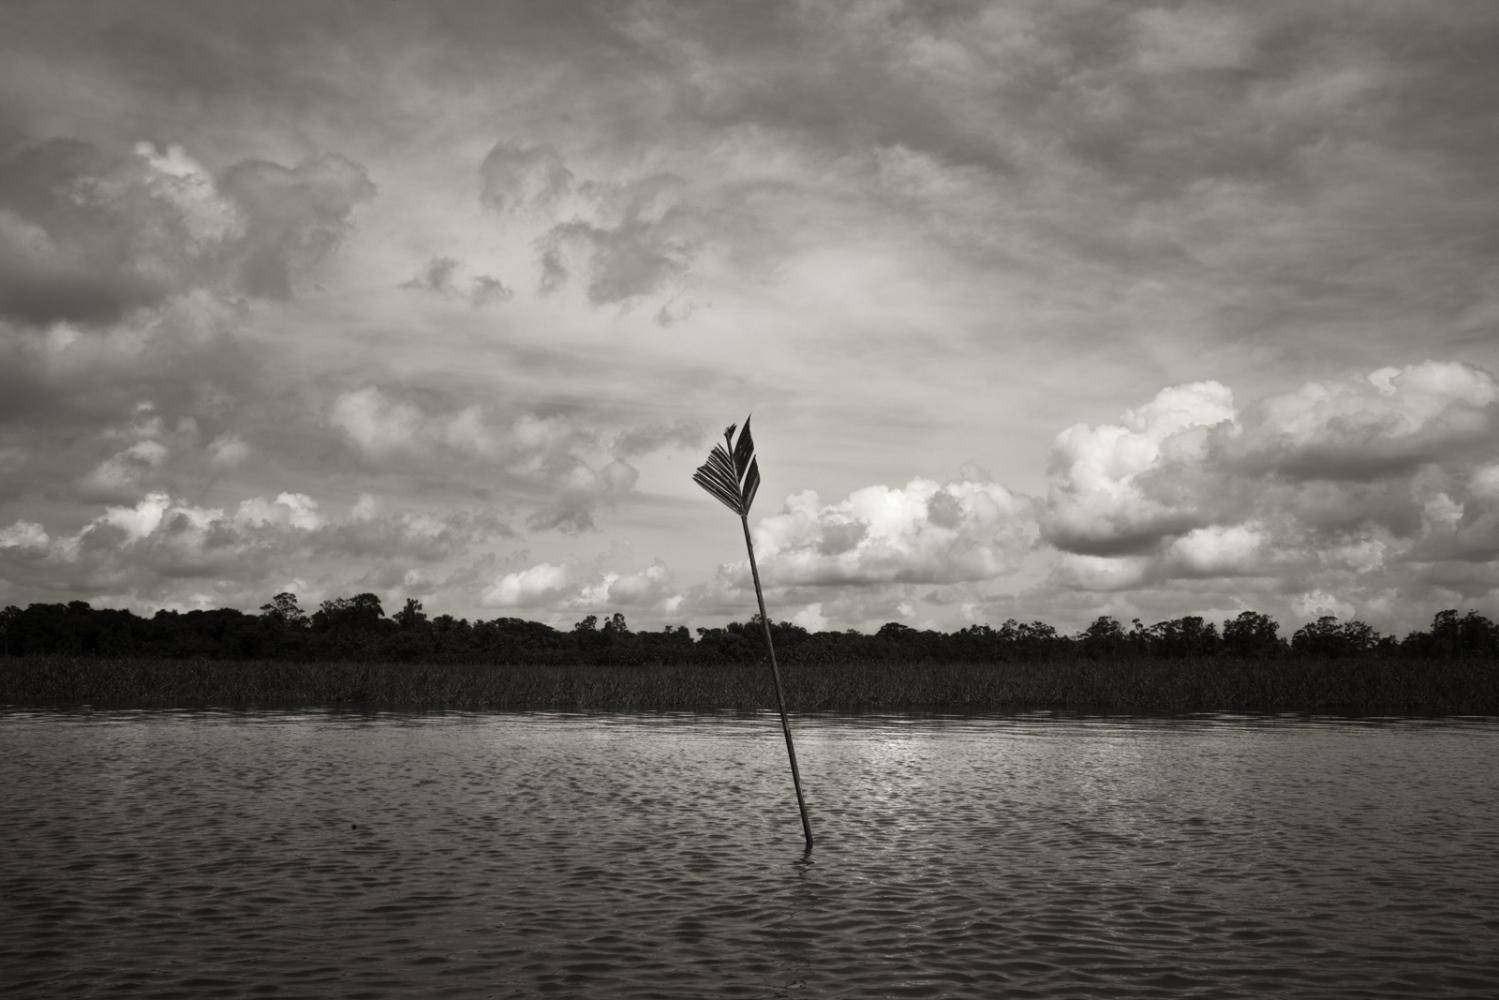 Art and Documentary Photography - Loading WEB_Waniku_AndreaSantolaya-1.jpg